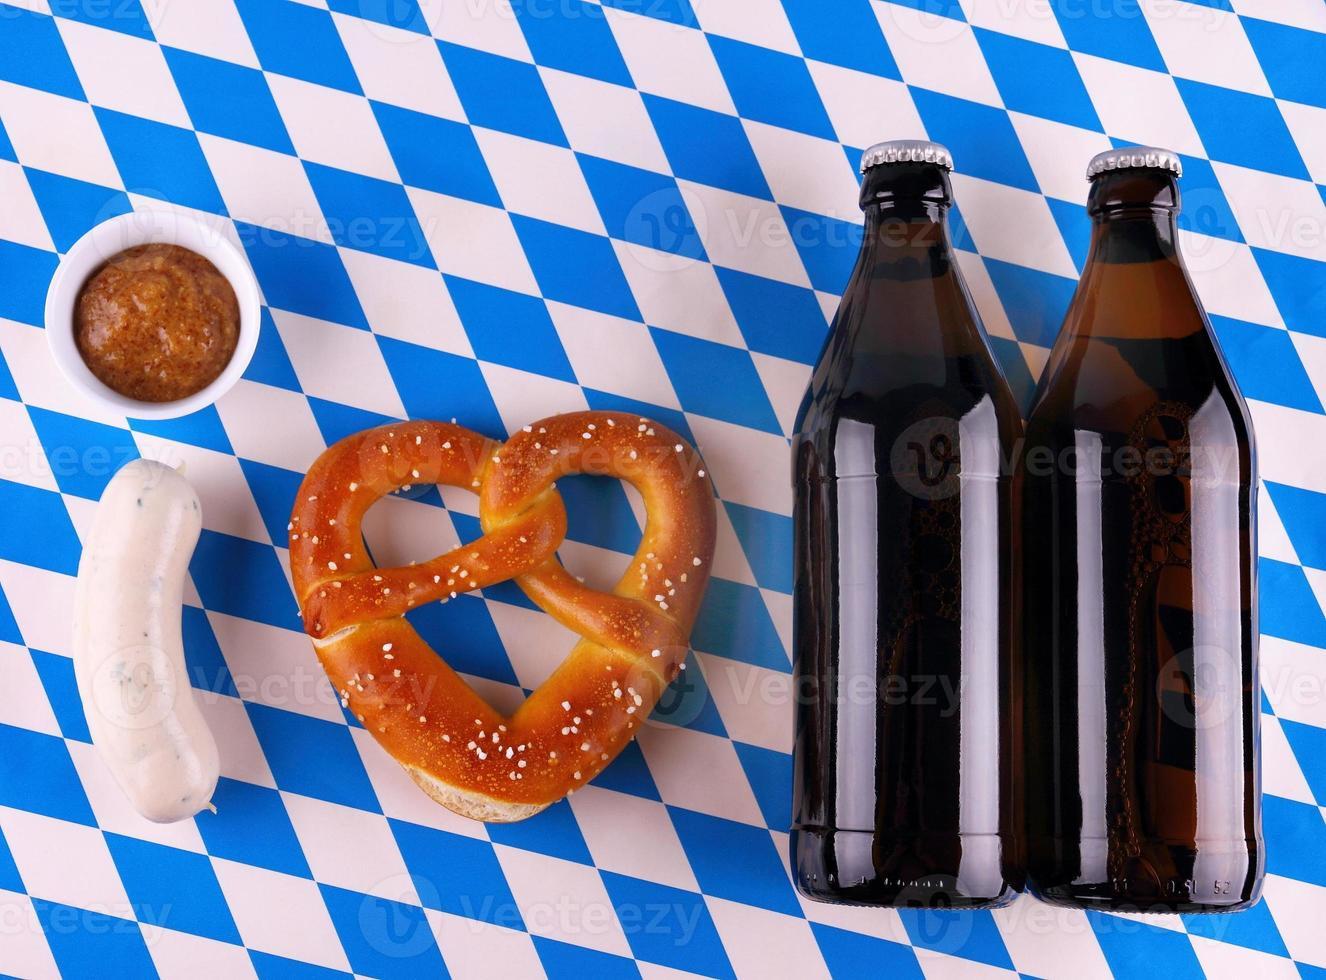 eu amo cerveja - conceito de oktoberfest de munique foto